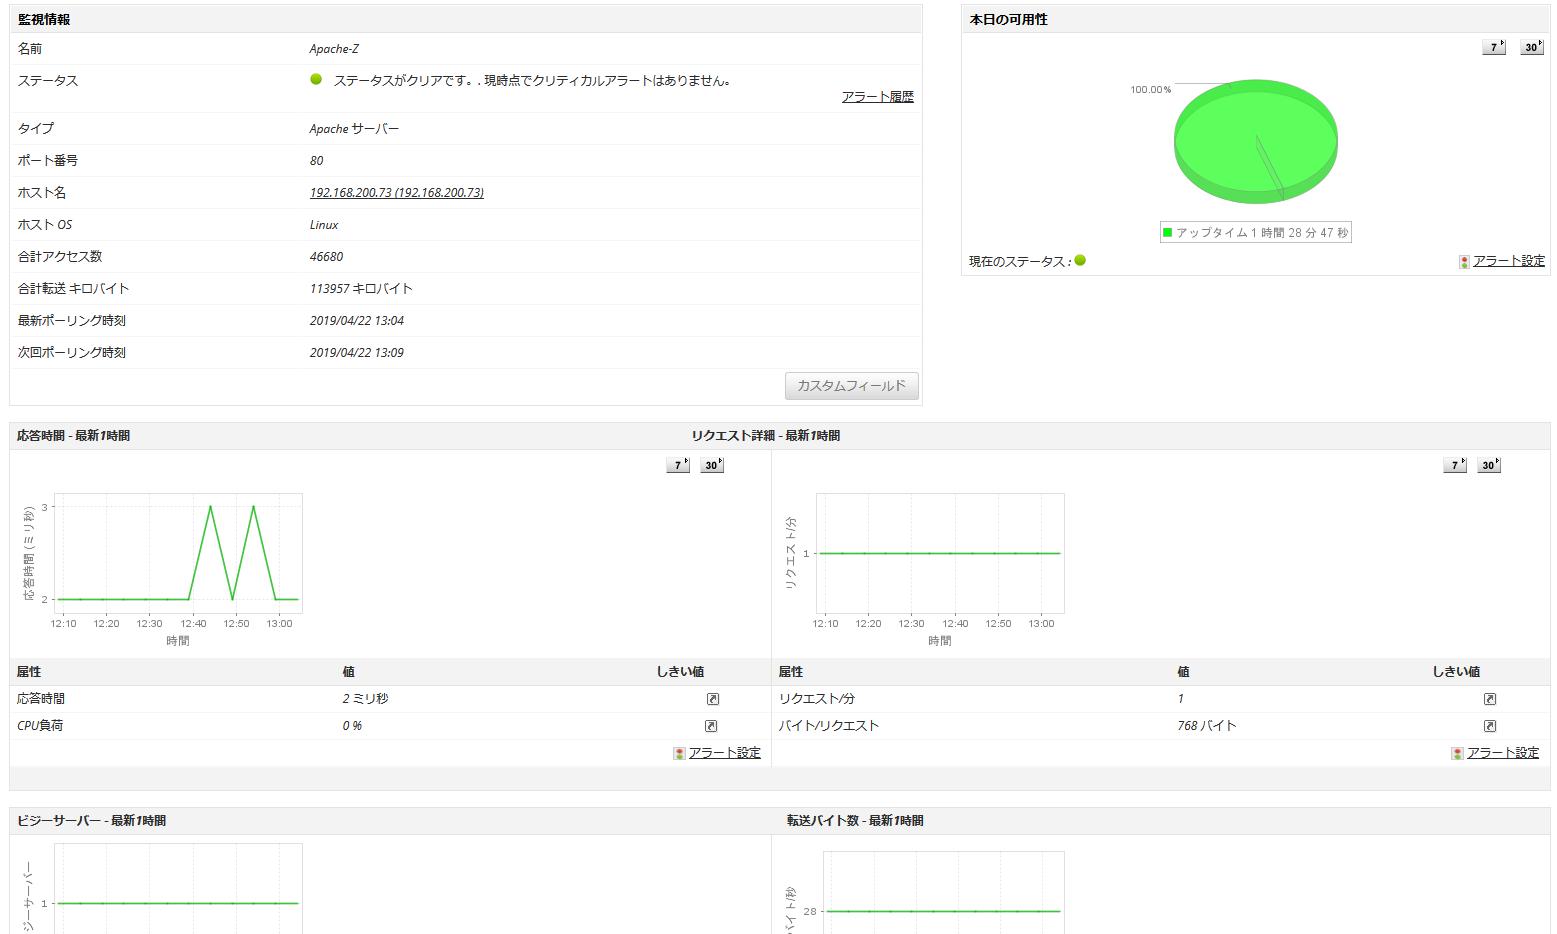 Apacheサーバー 監視画面(スナップショットビュー)